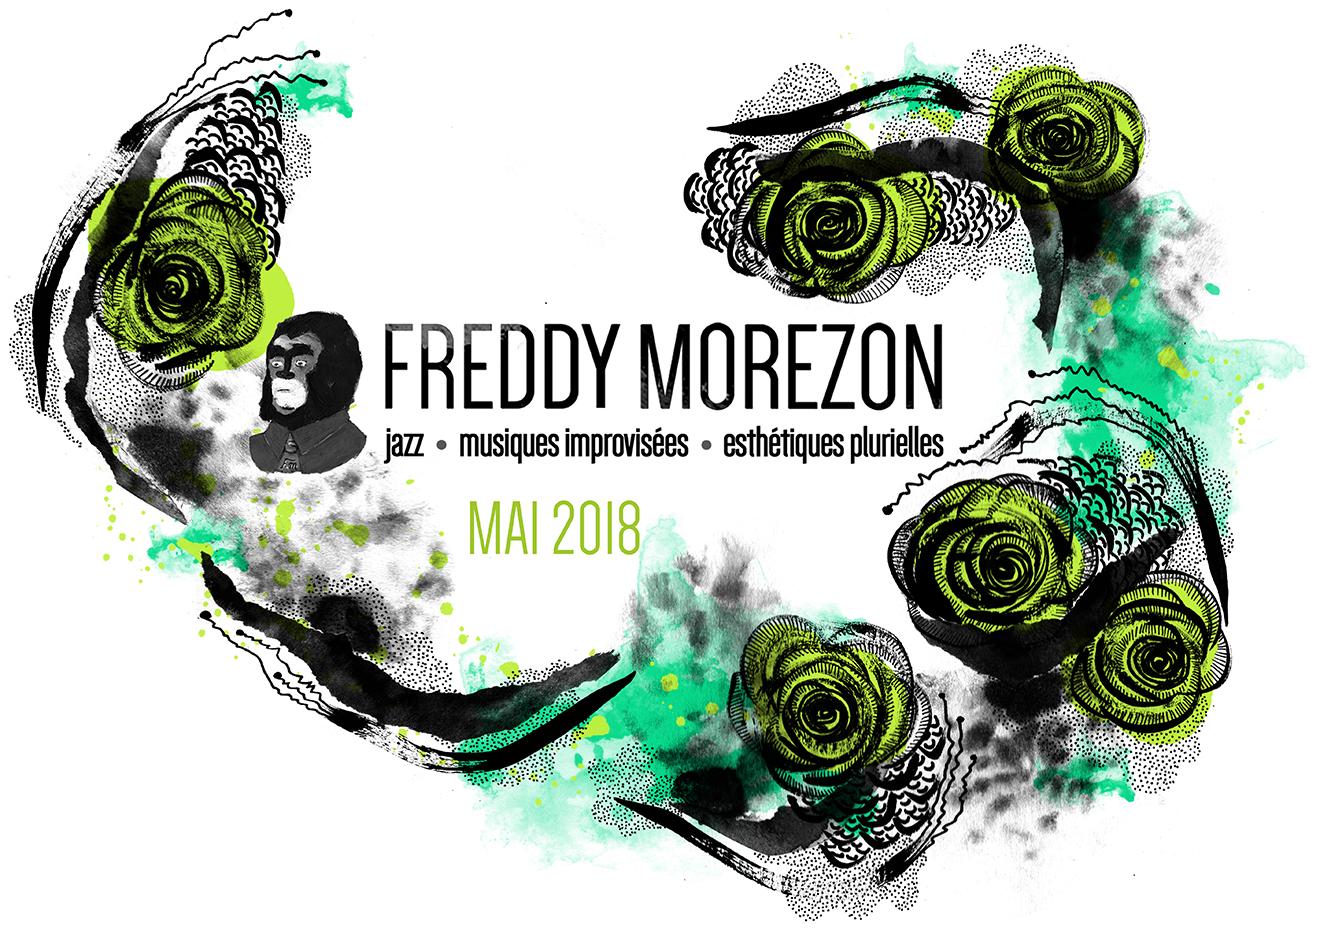 Freddy Morezon - Newsletter mai 2018